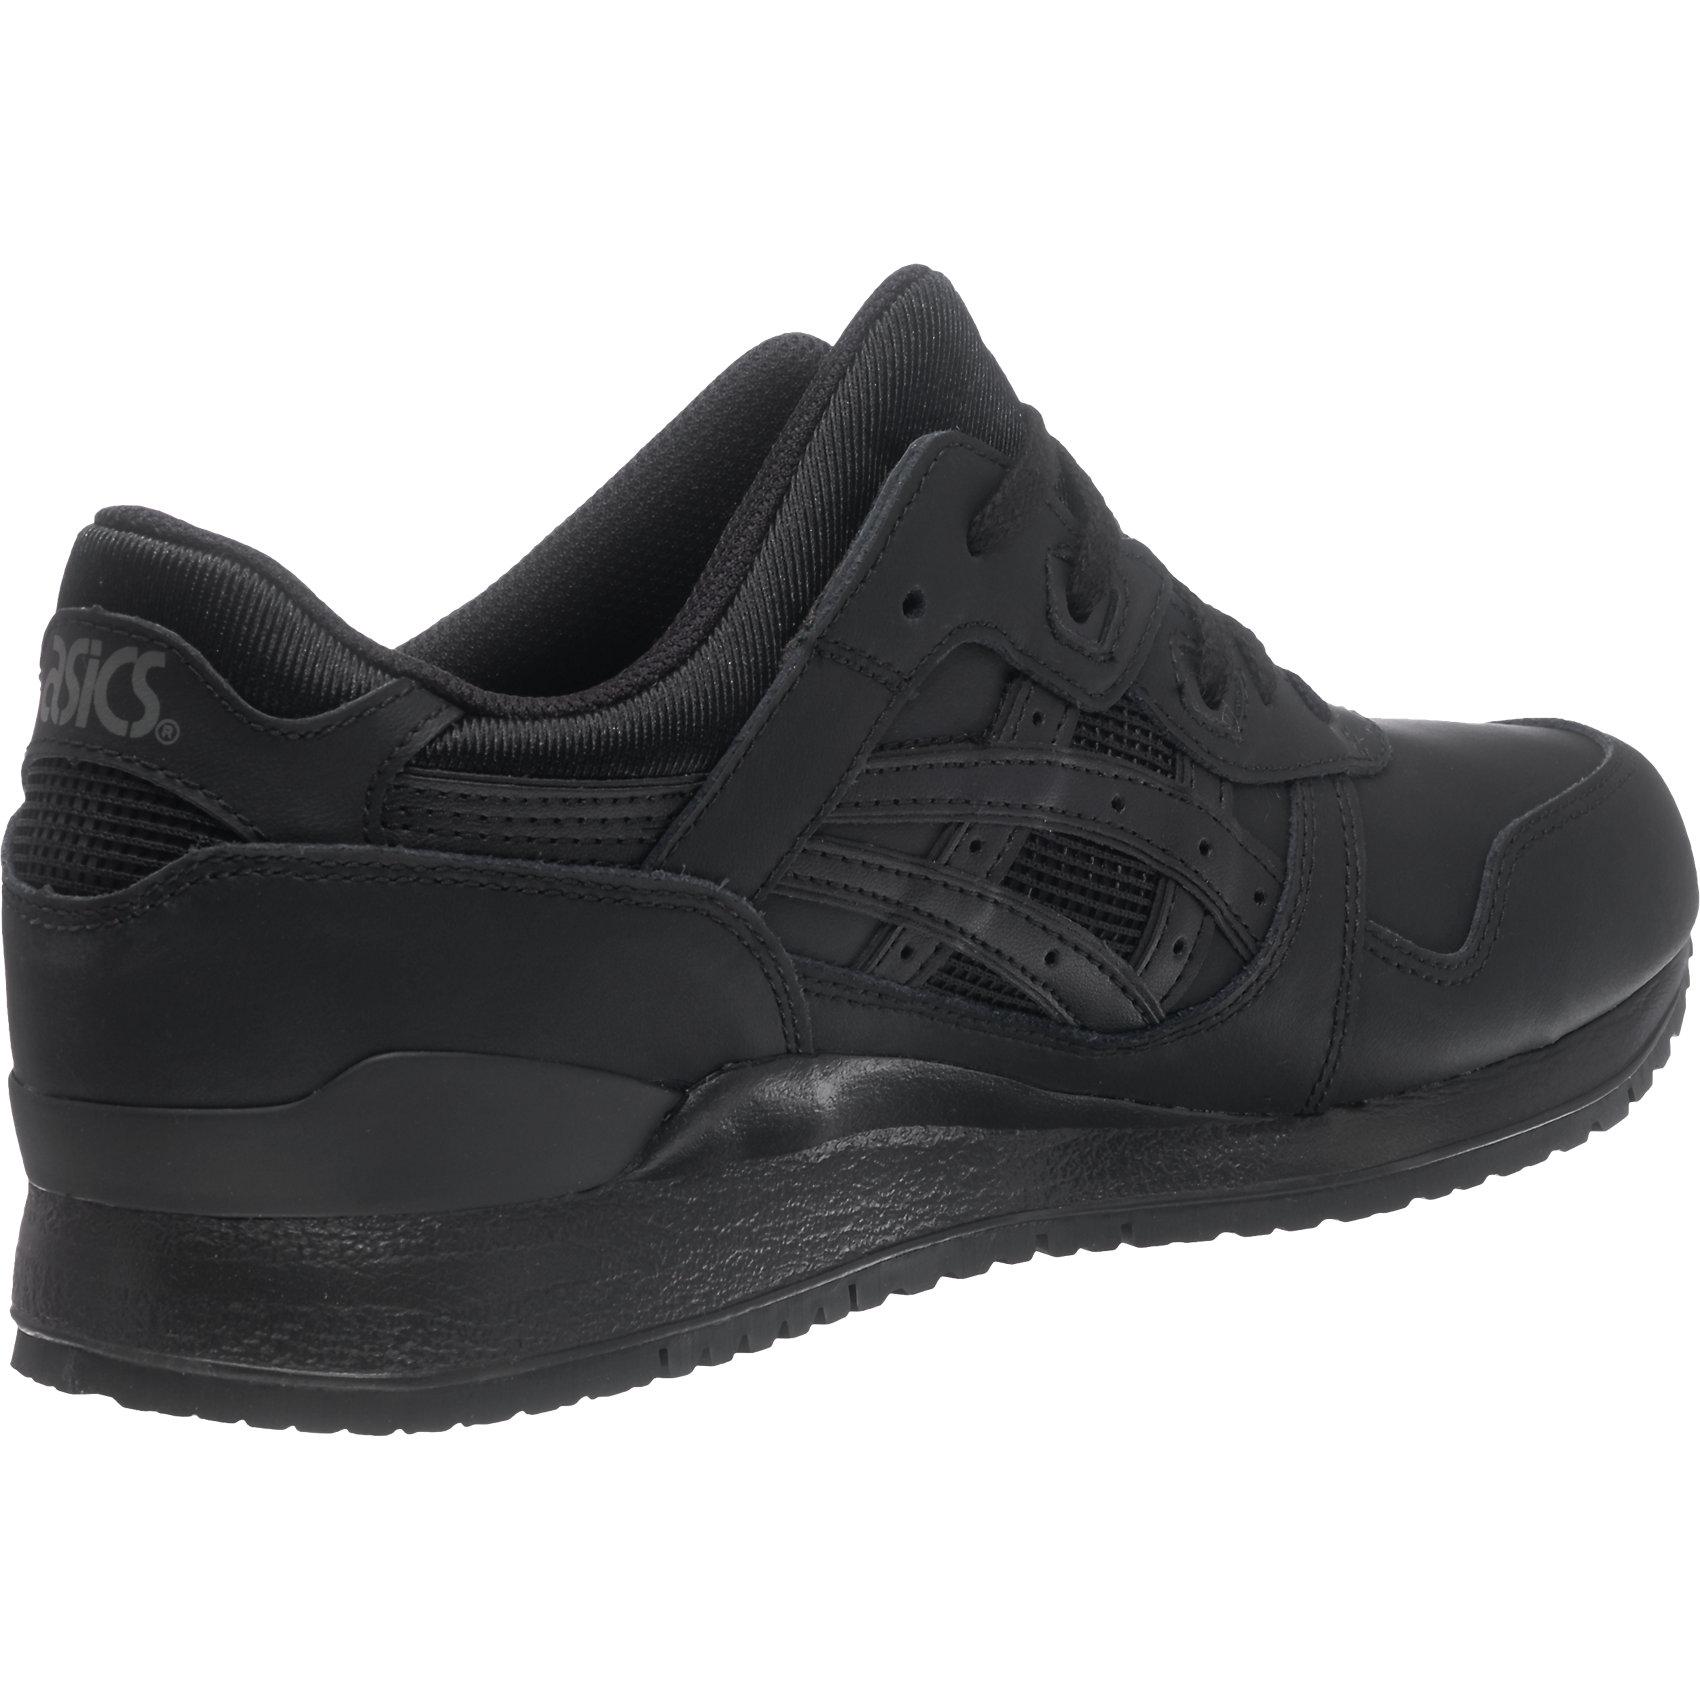 Neu ASICS Tiger Gel-Lyte III Sneakers schwarz 6924939